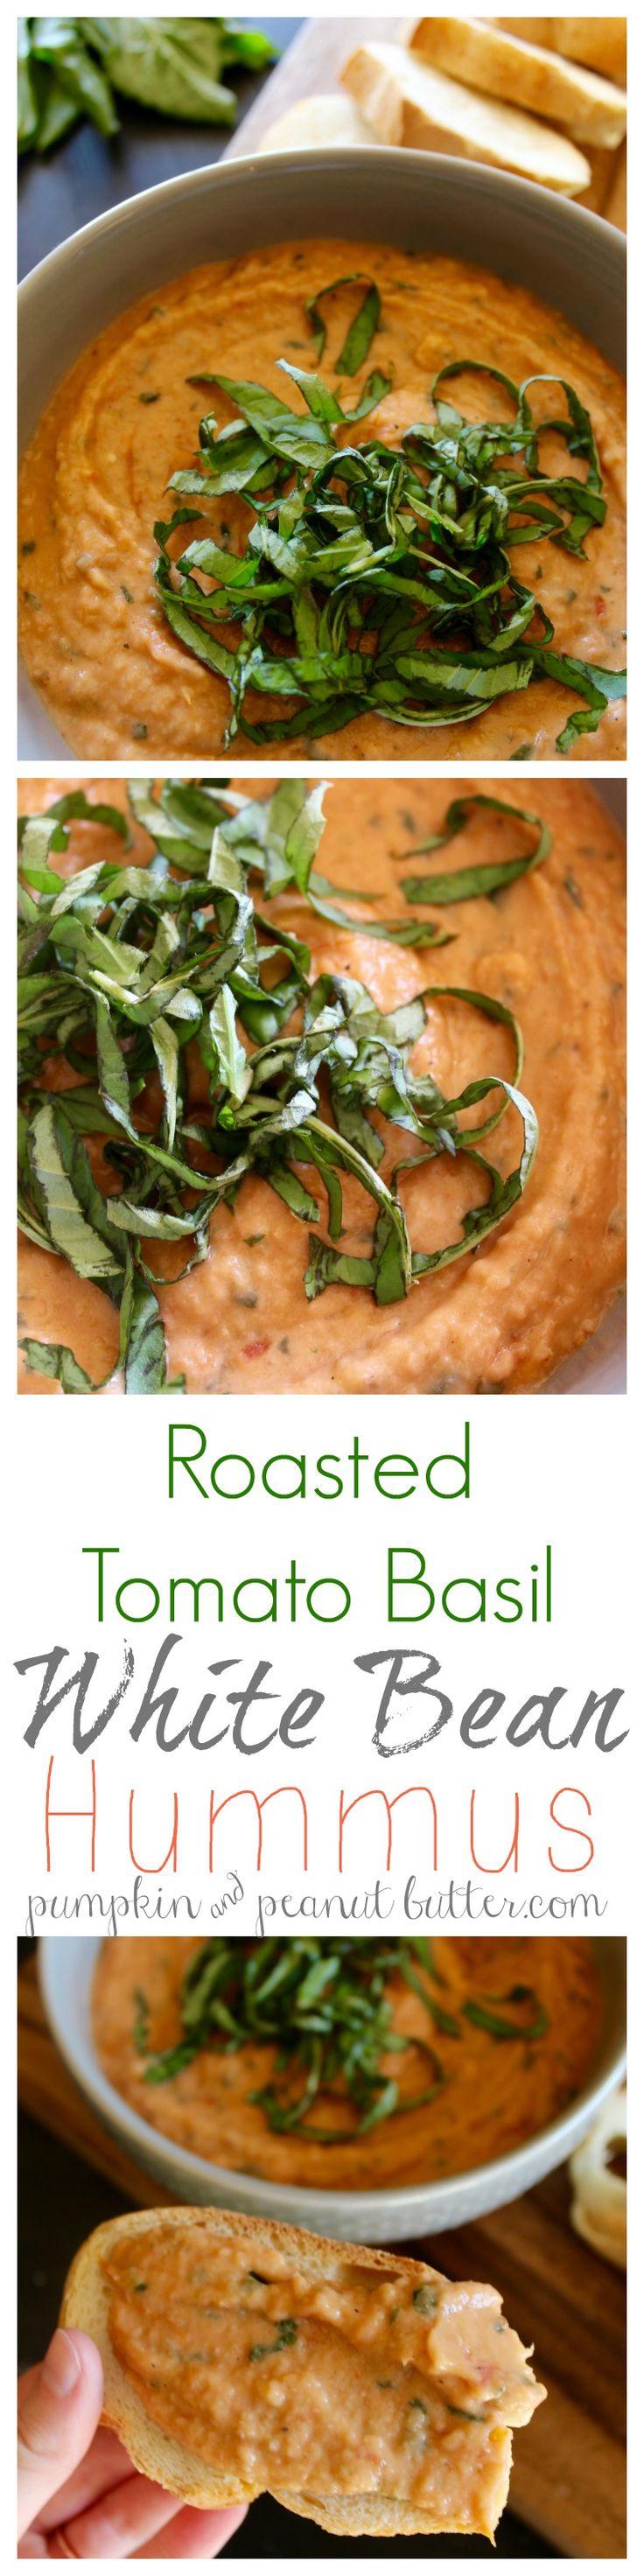 Roasted Tomato Basil White Bean Hummus // pumpkin & peanut butter {vegan, gluten free}